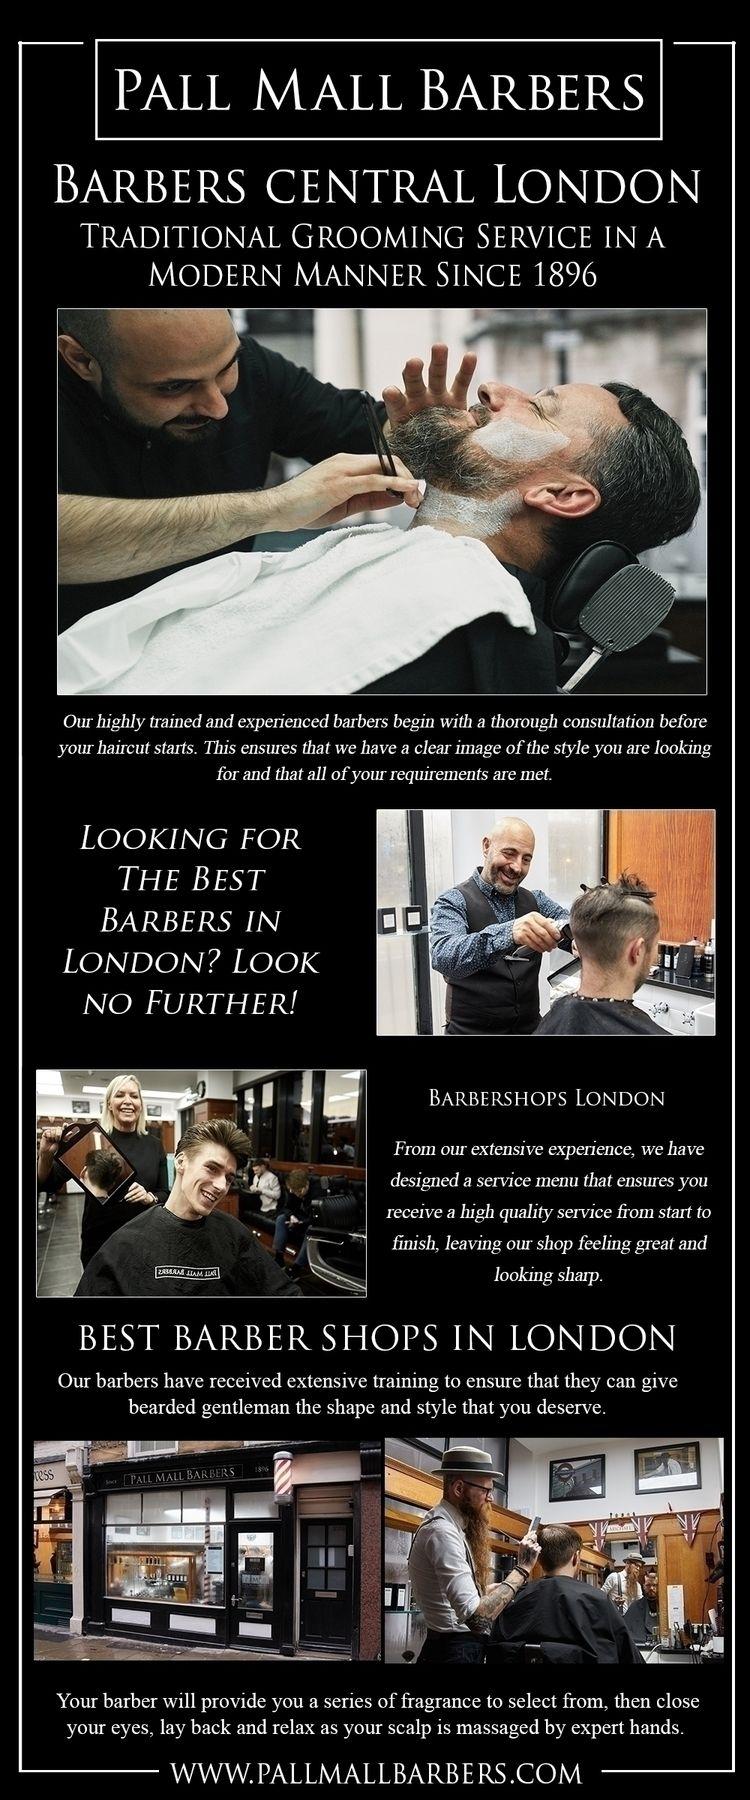 London barbers - haircut offers - barbersinlondon | ello